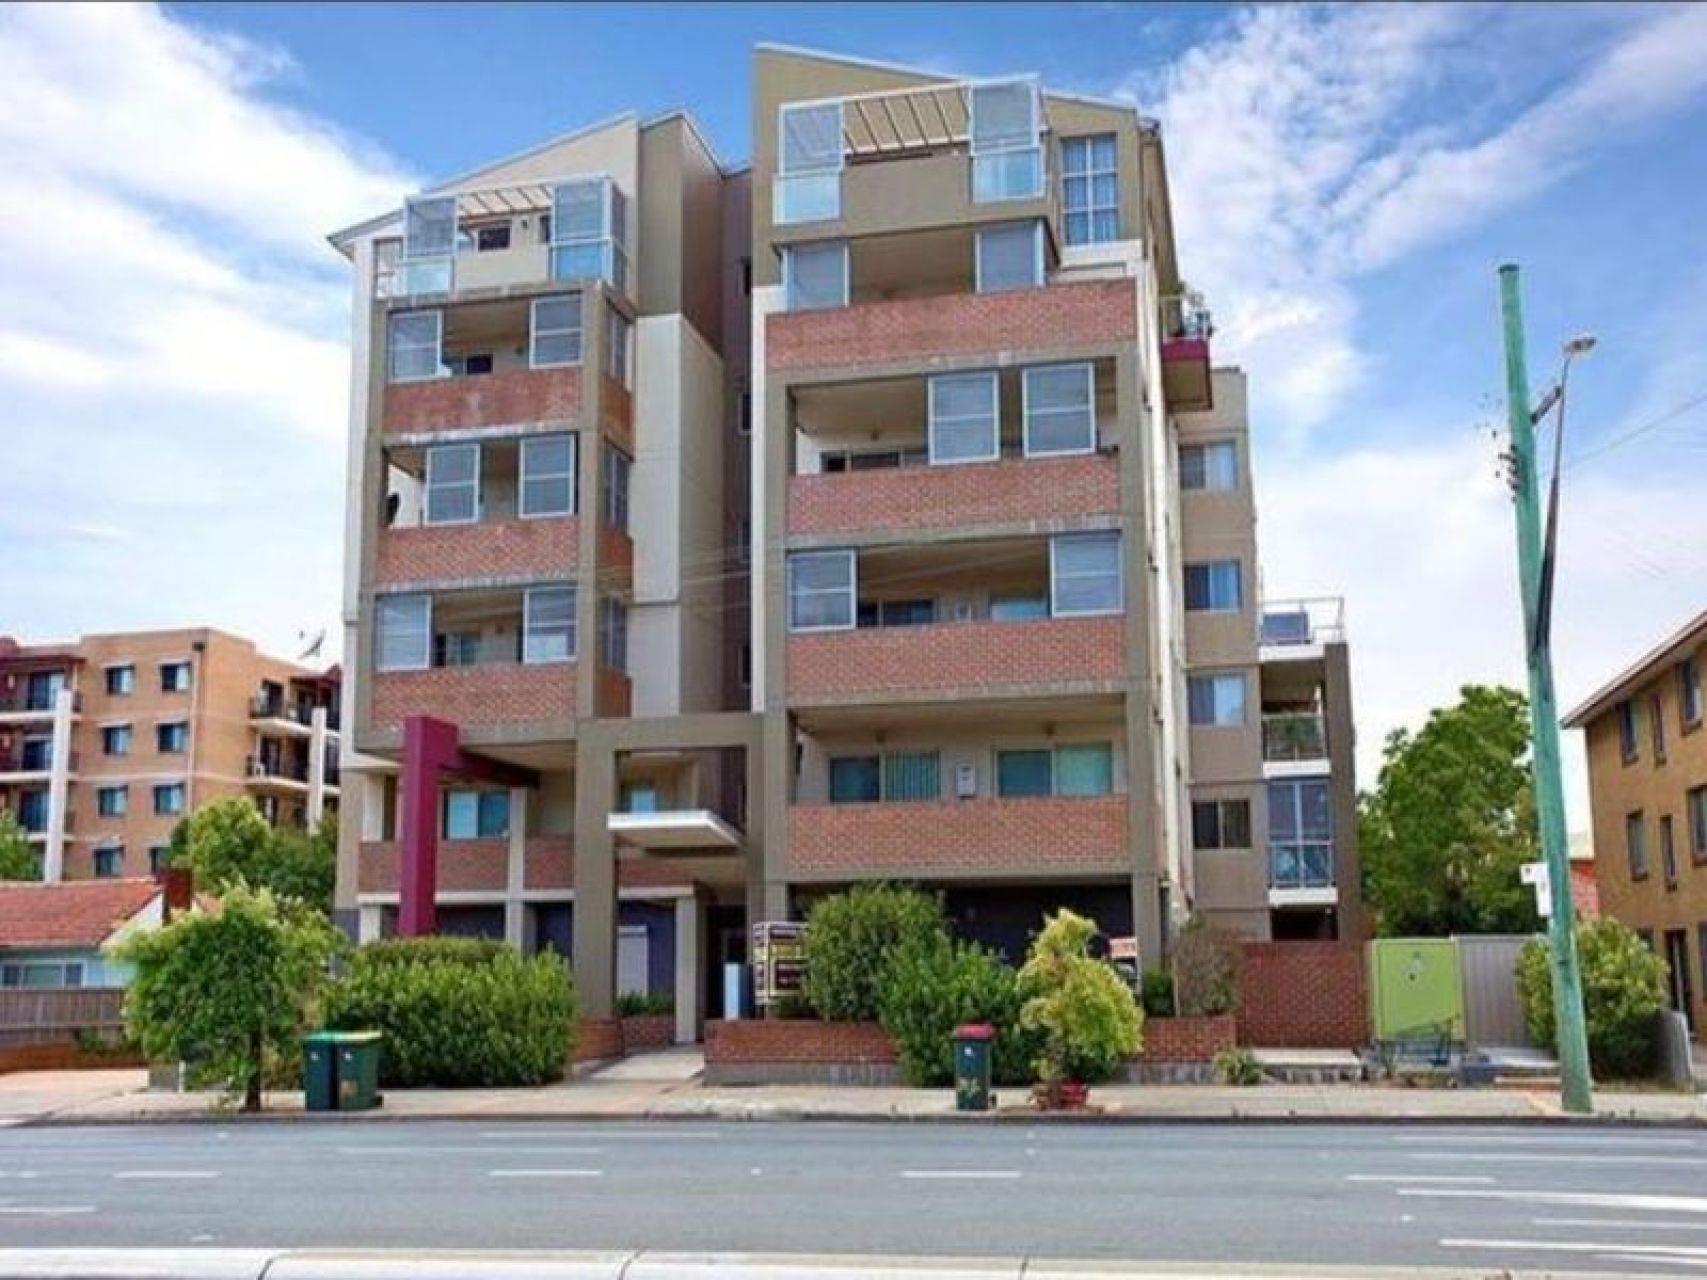 26/30-32 Copeland St, Liverpool, NSW 2170